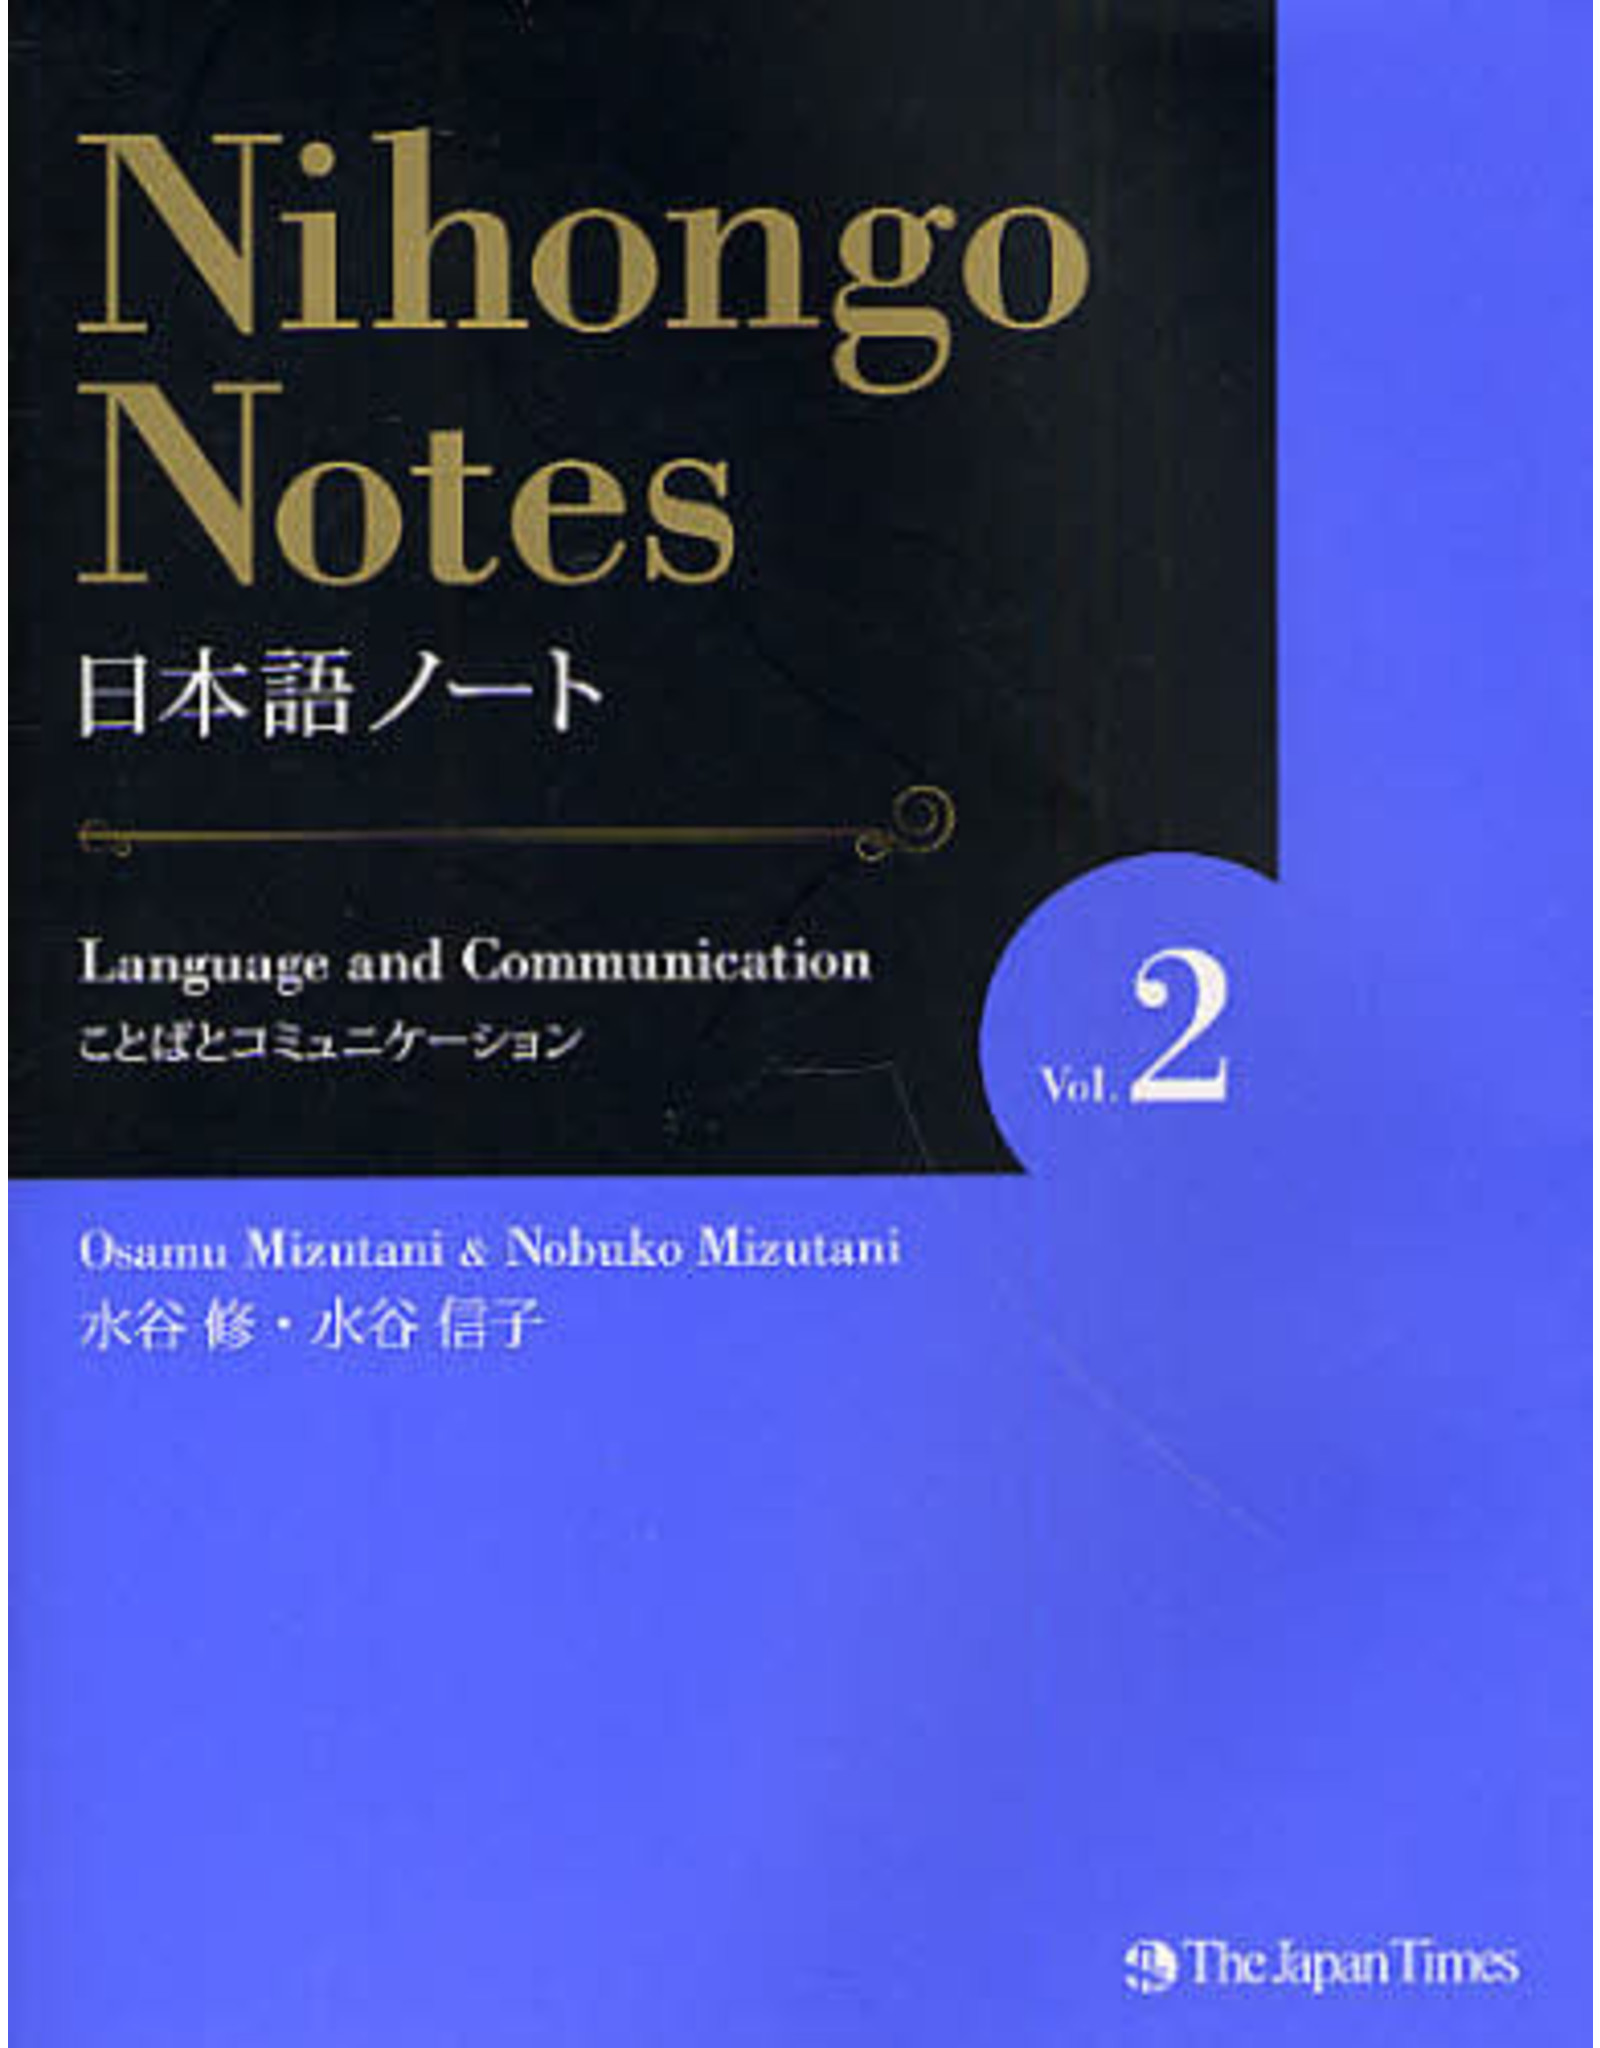 JAPAN TIMES NIHONGO NOTE VOL.2